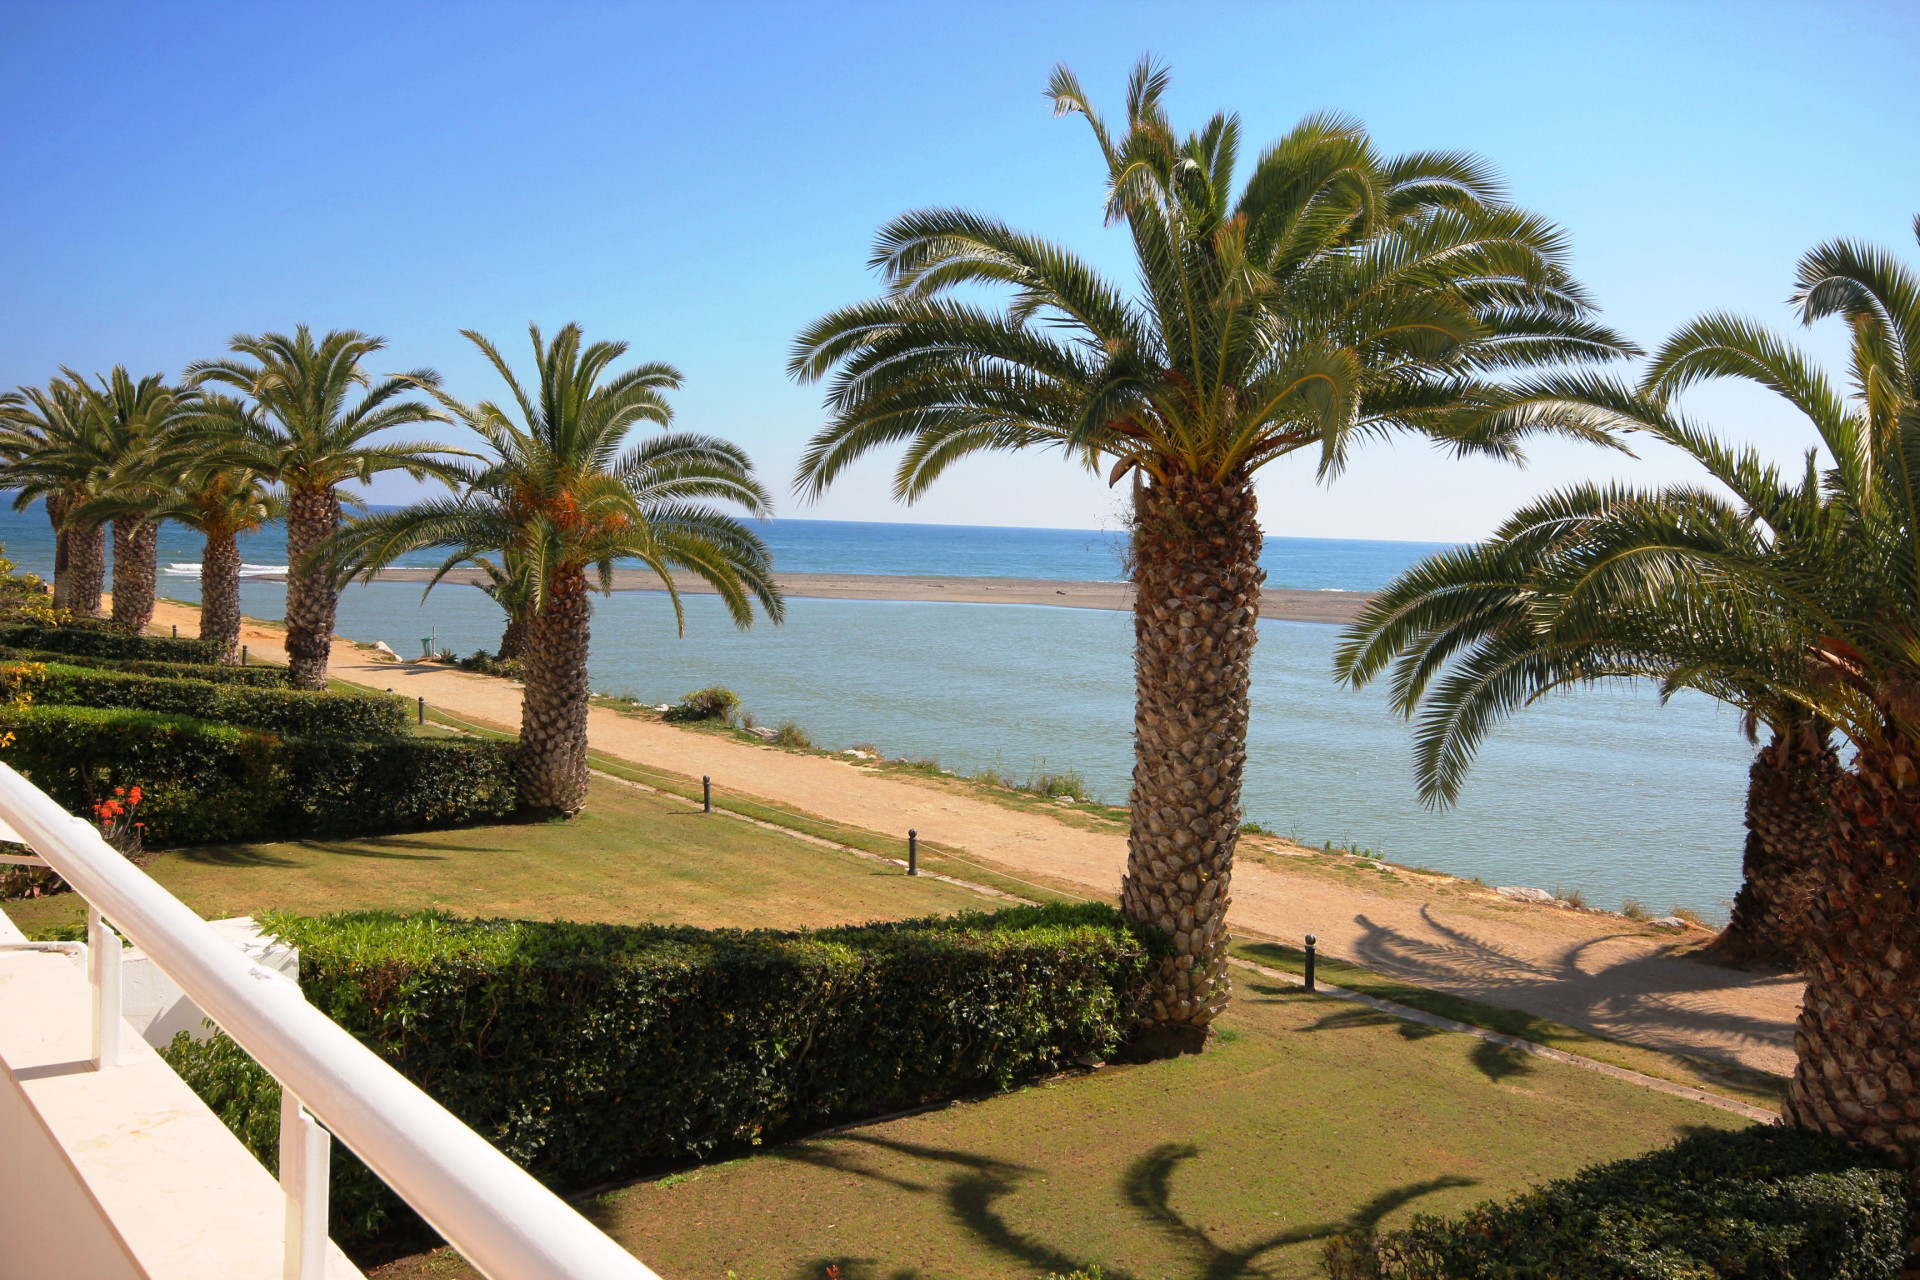 Apartment for sale in Playa en Sotogrande, Sotogrande